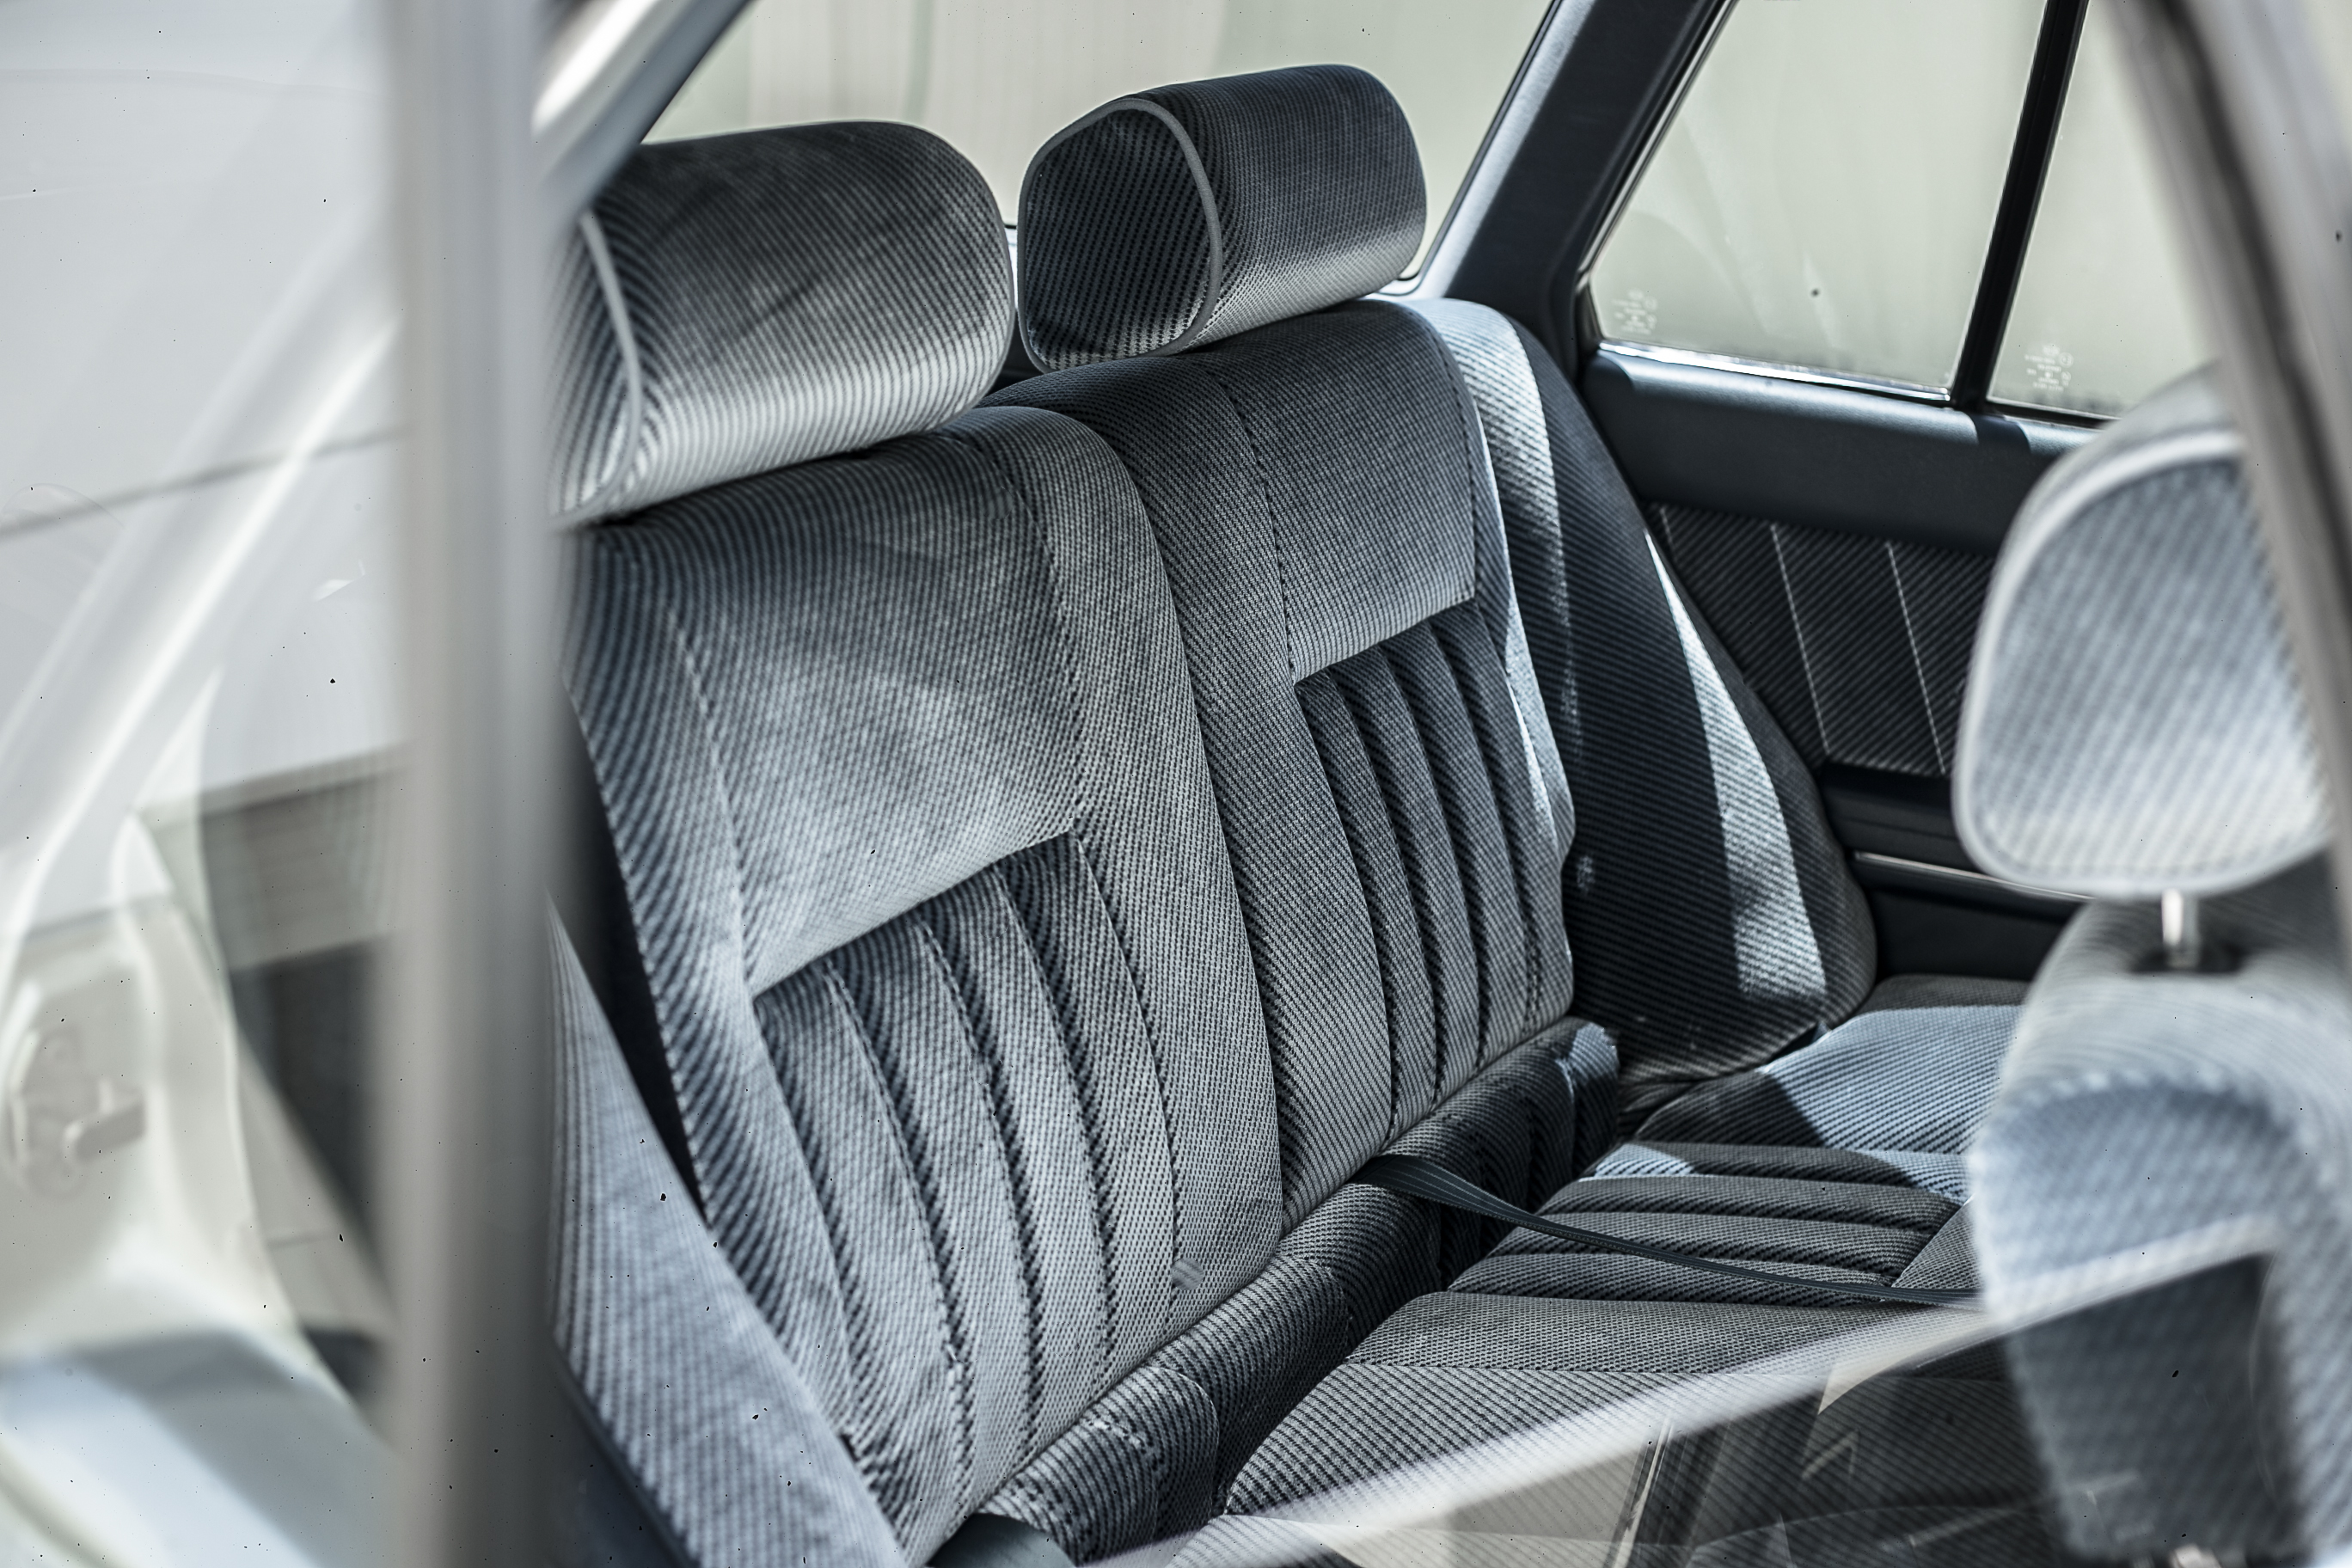 Nissan R31 Skyline turbo wagon back seat